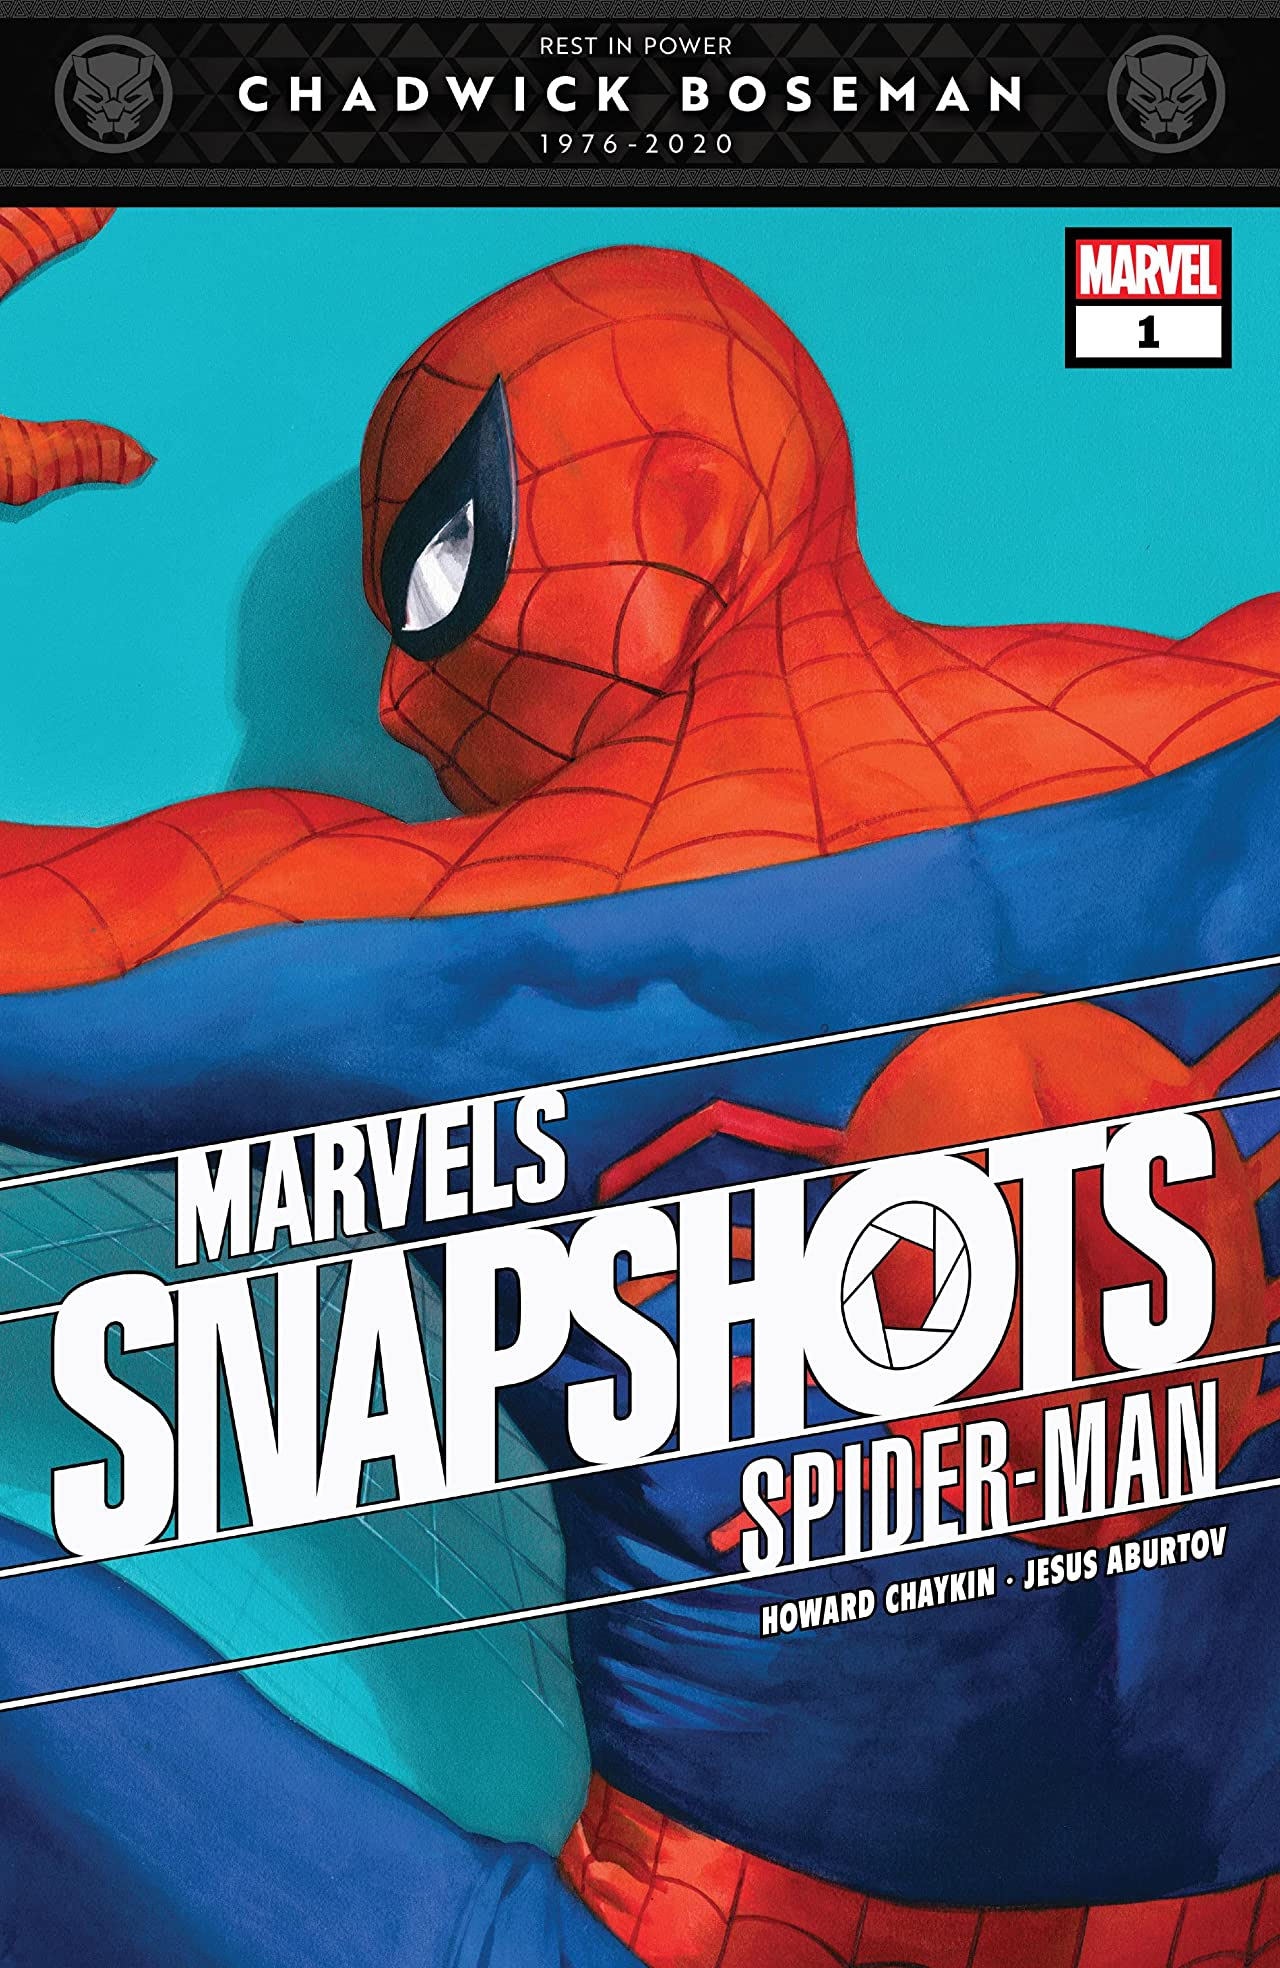 Marvels Snapshots: Spider-Man Vol 1